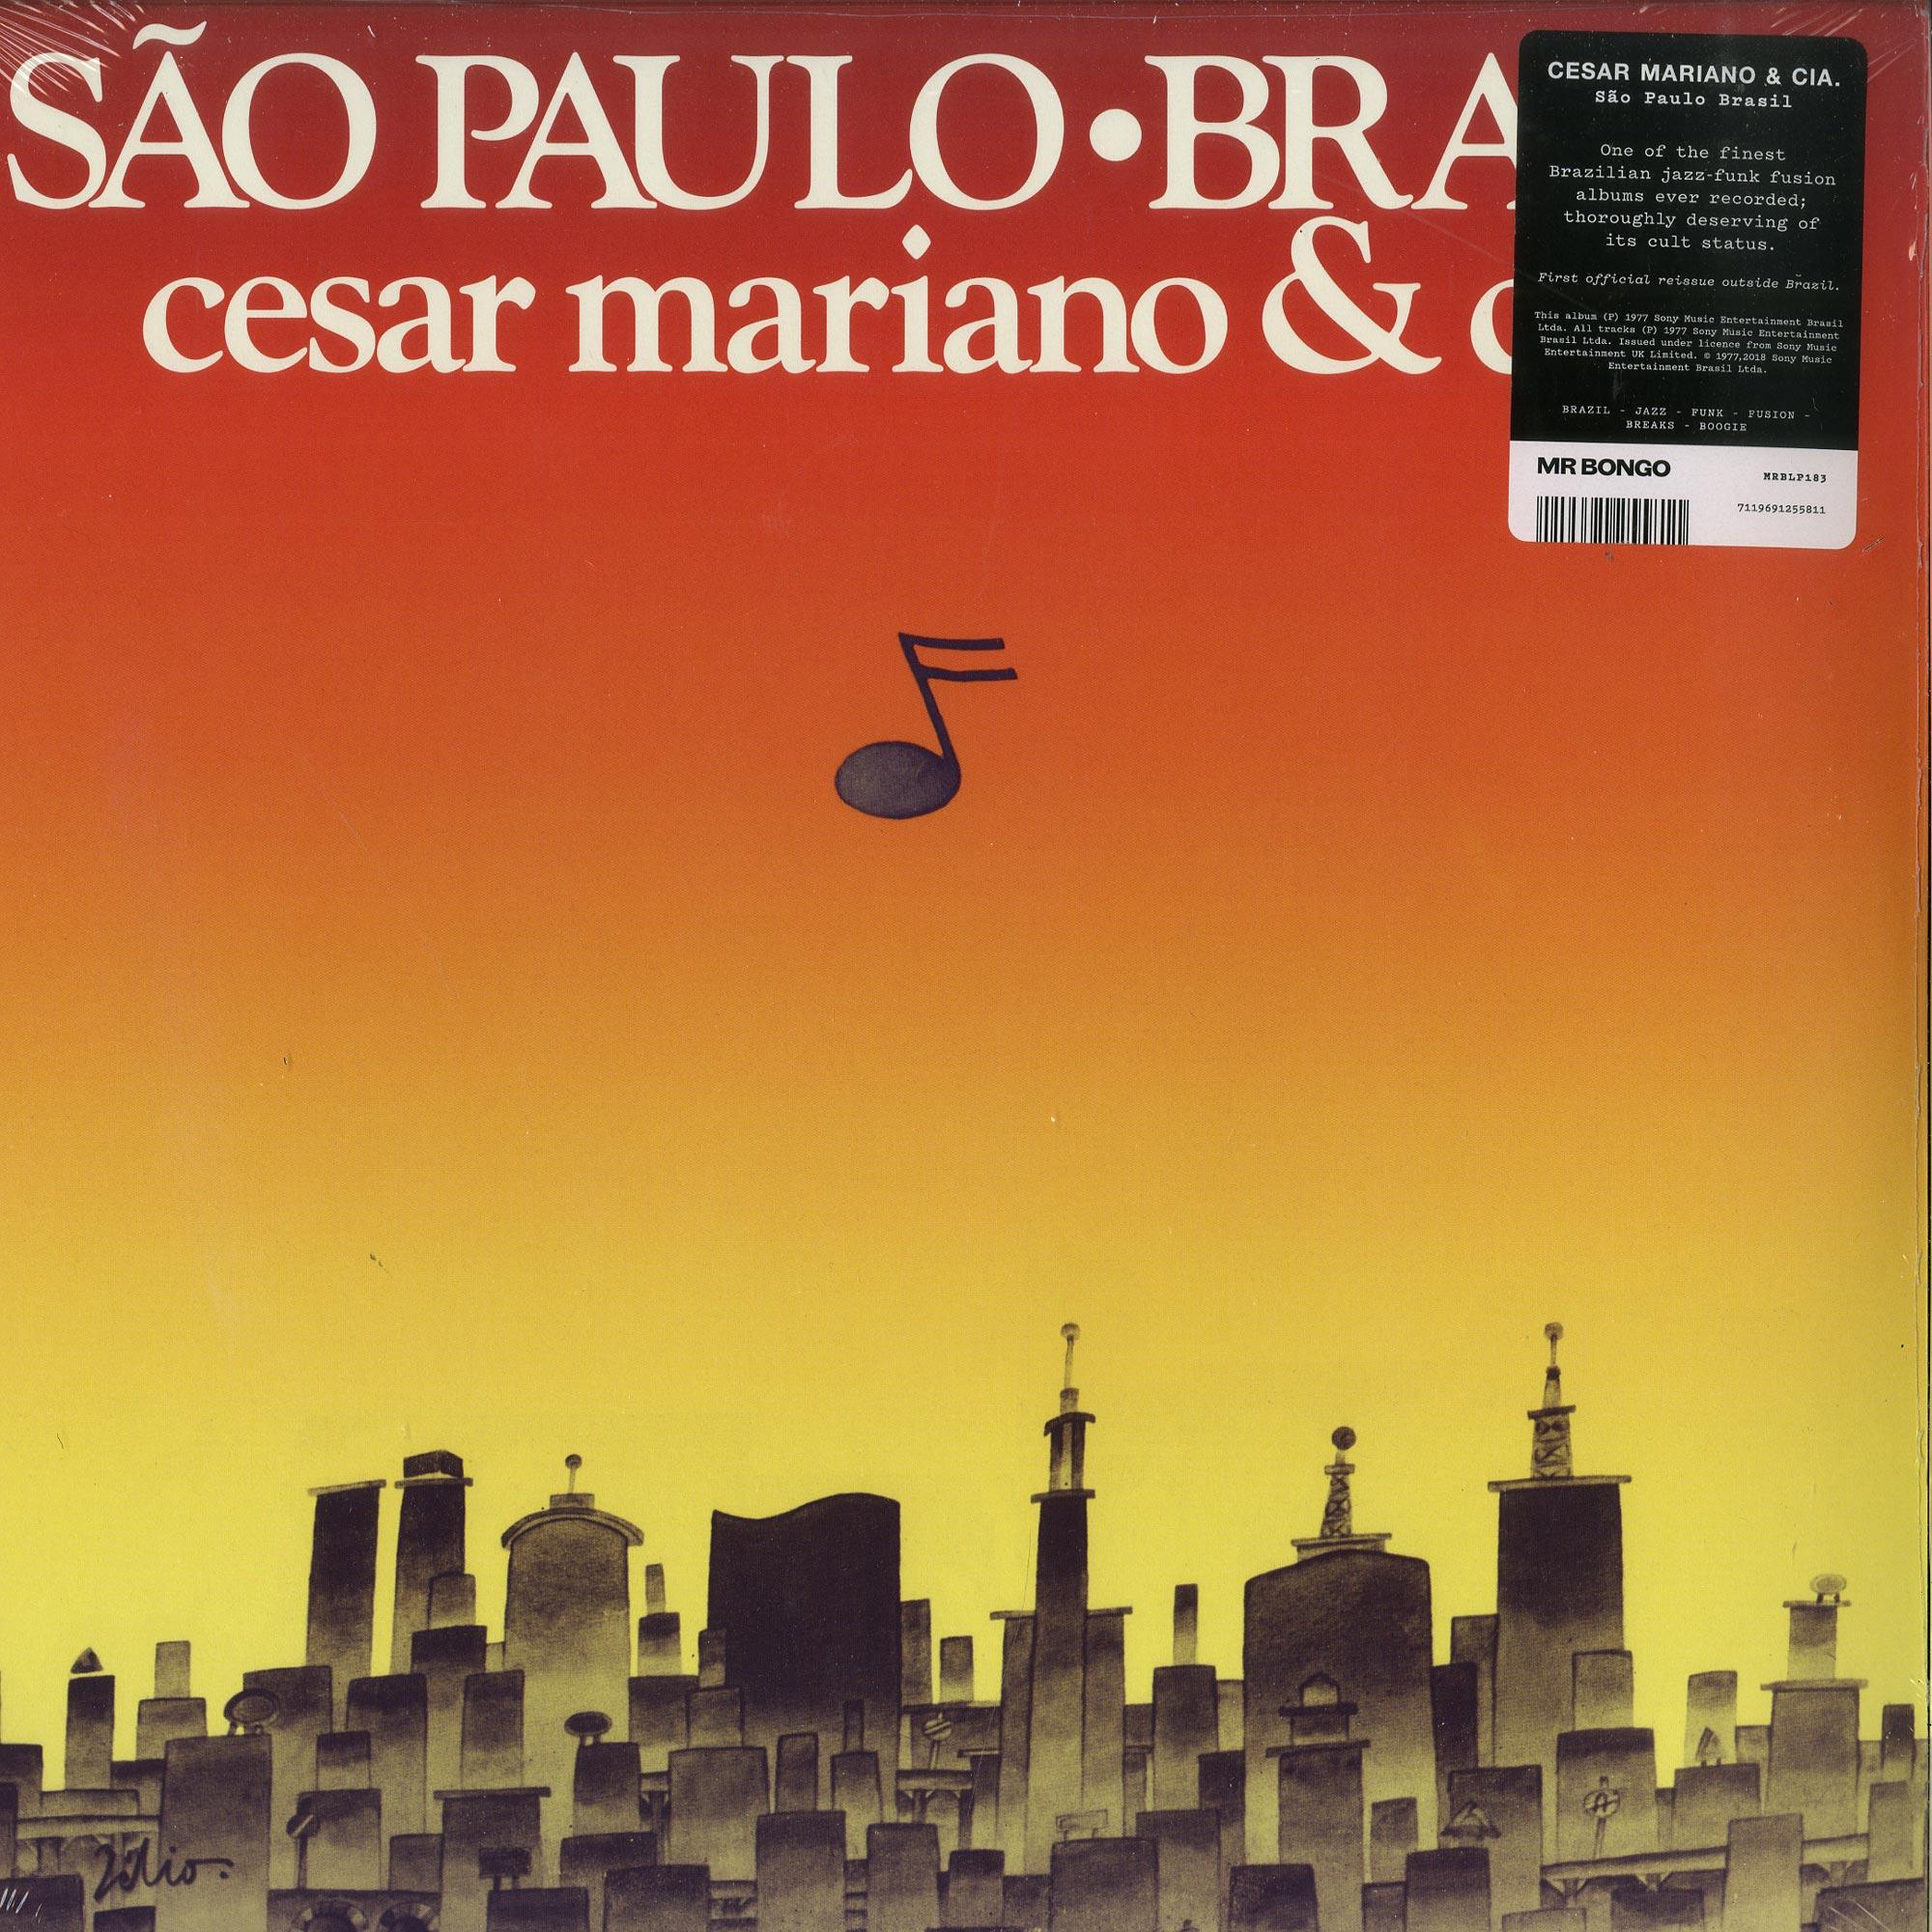 Cesar Mariano & Cia - SAO PAULO: BRASIL